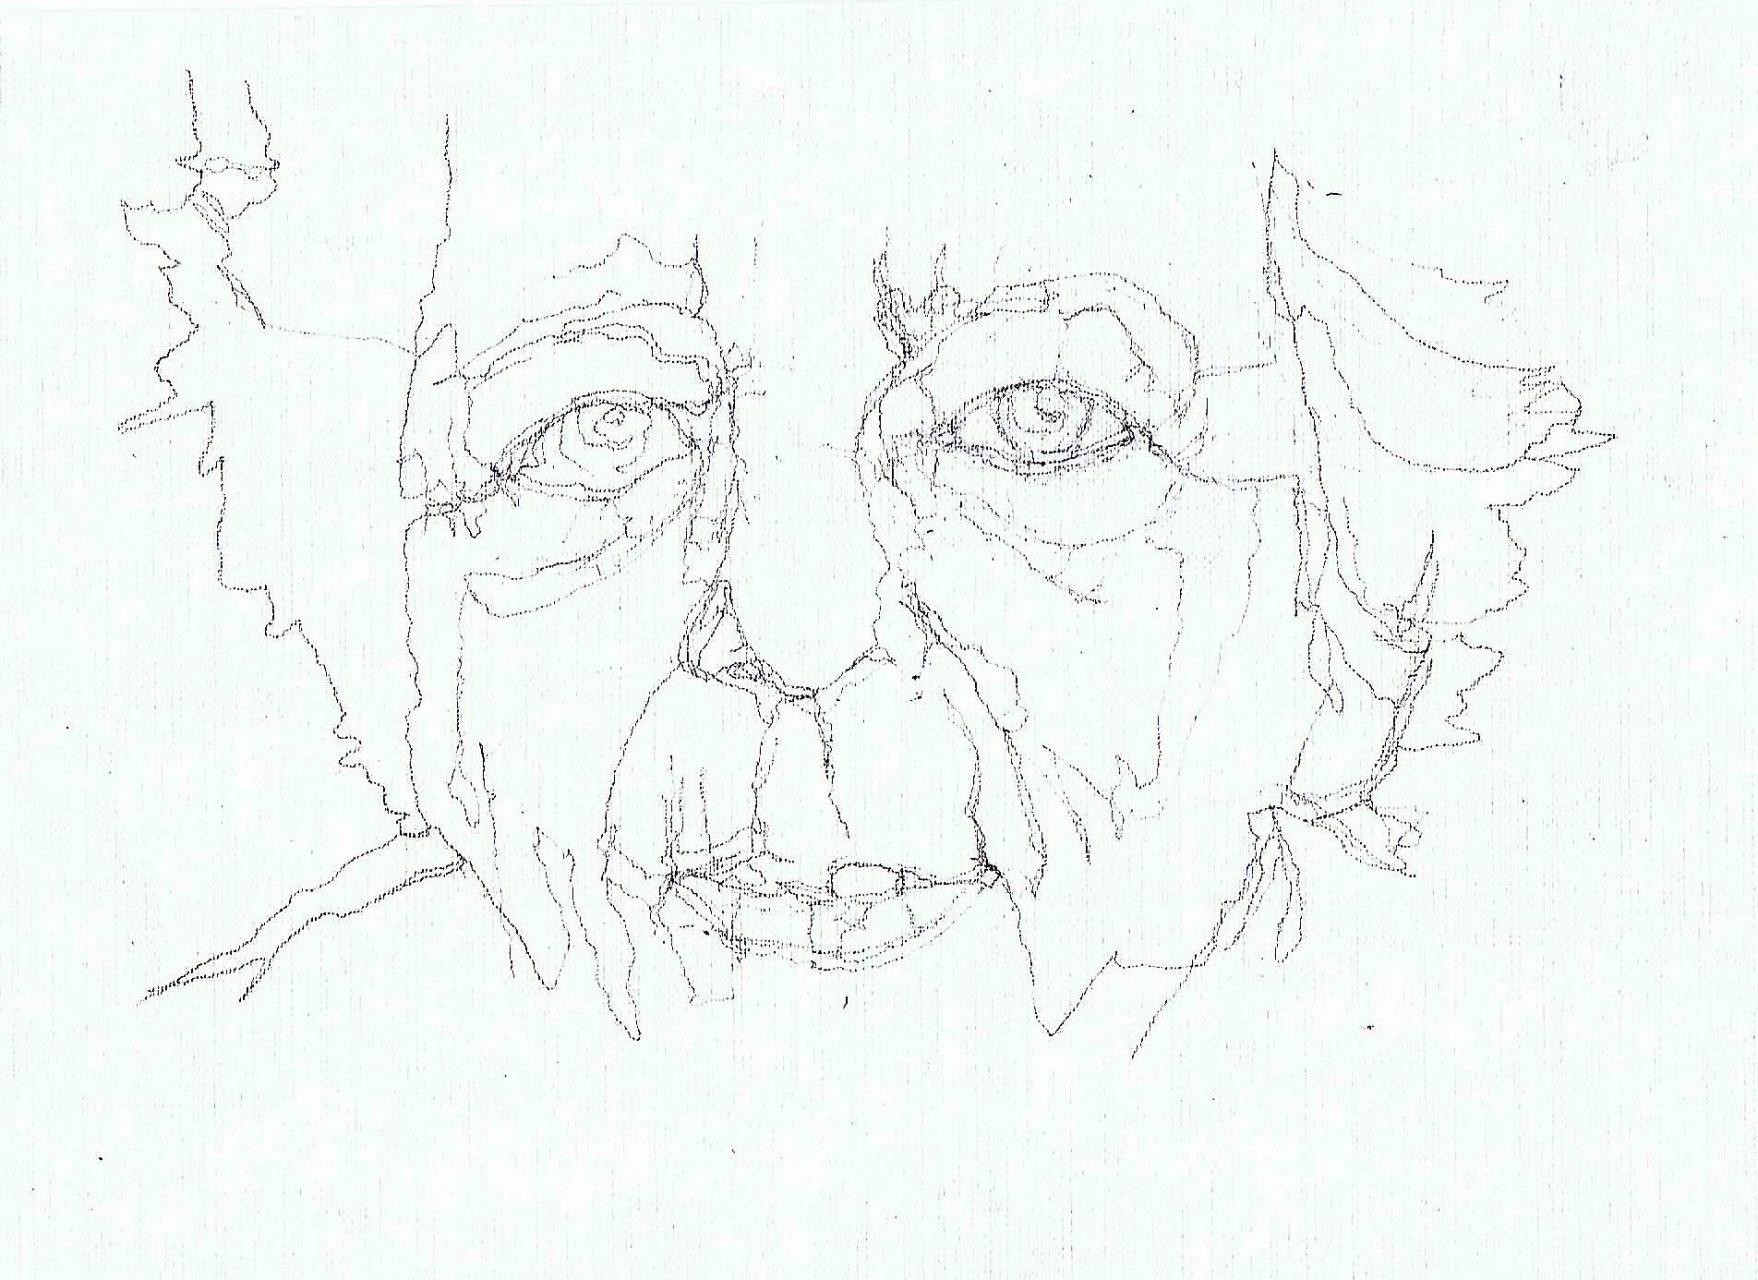 365 dagen een portret Renate Dorrestein, schrijfster Potlood 19c25